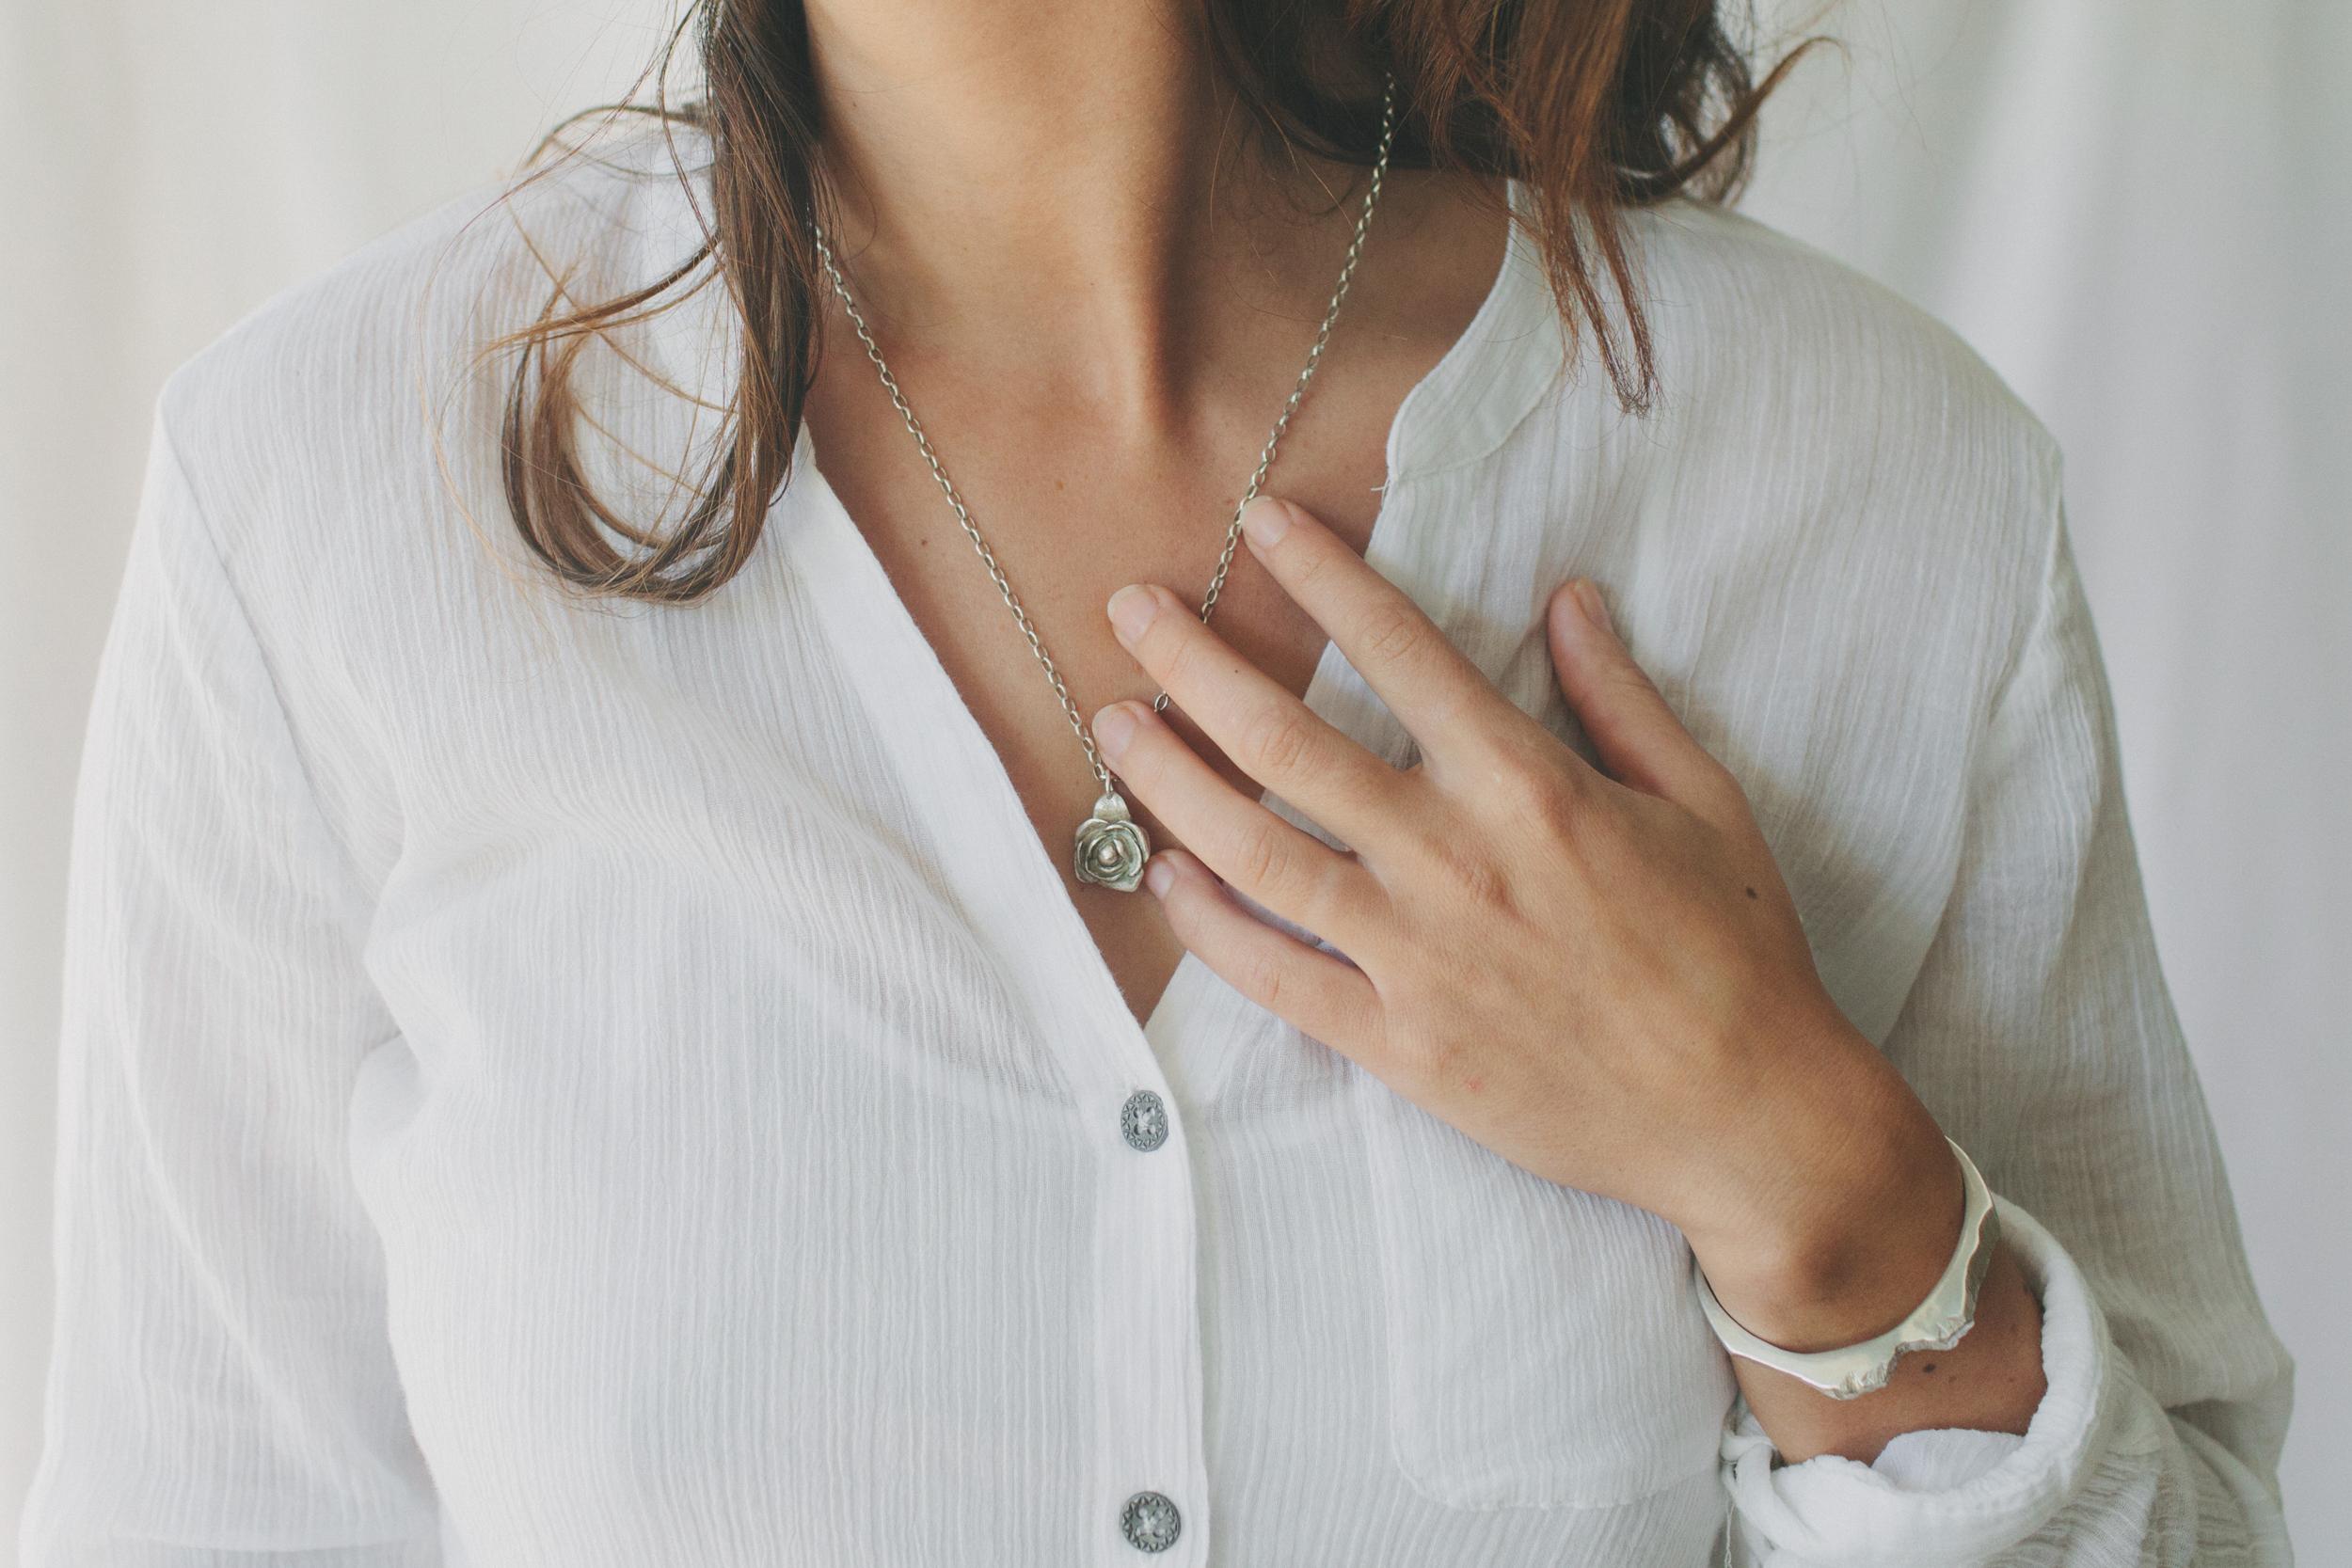 Lady Rose Necklace, Valleys & Peaks Bracelet